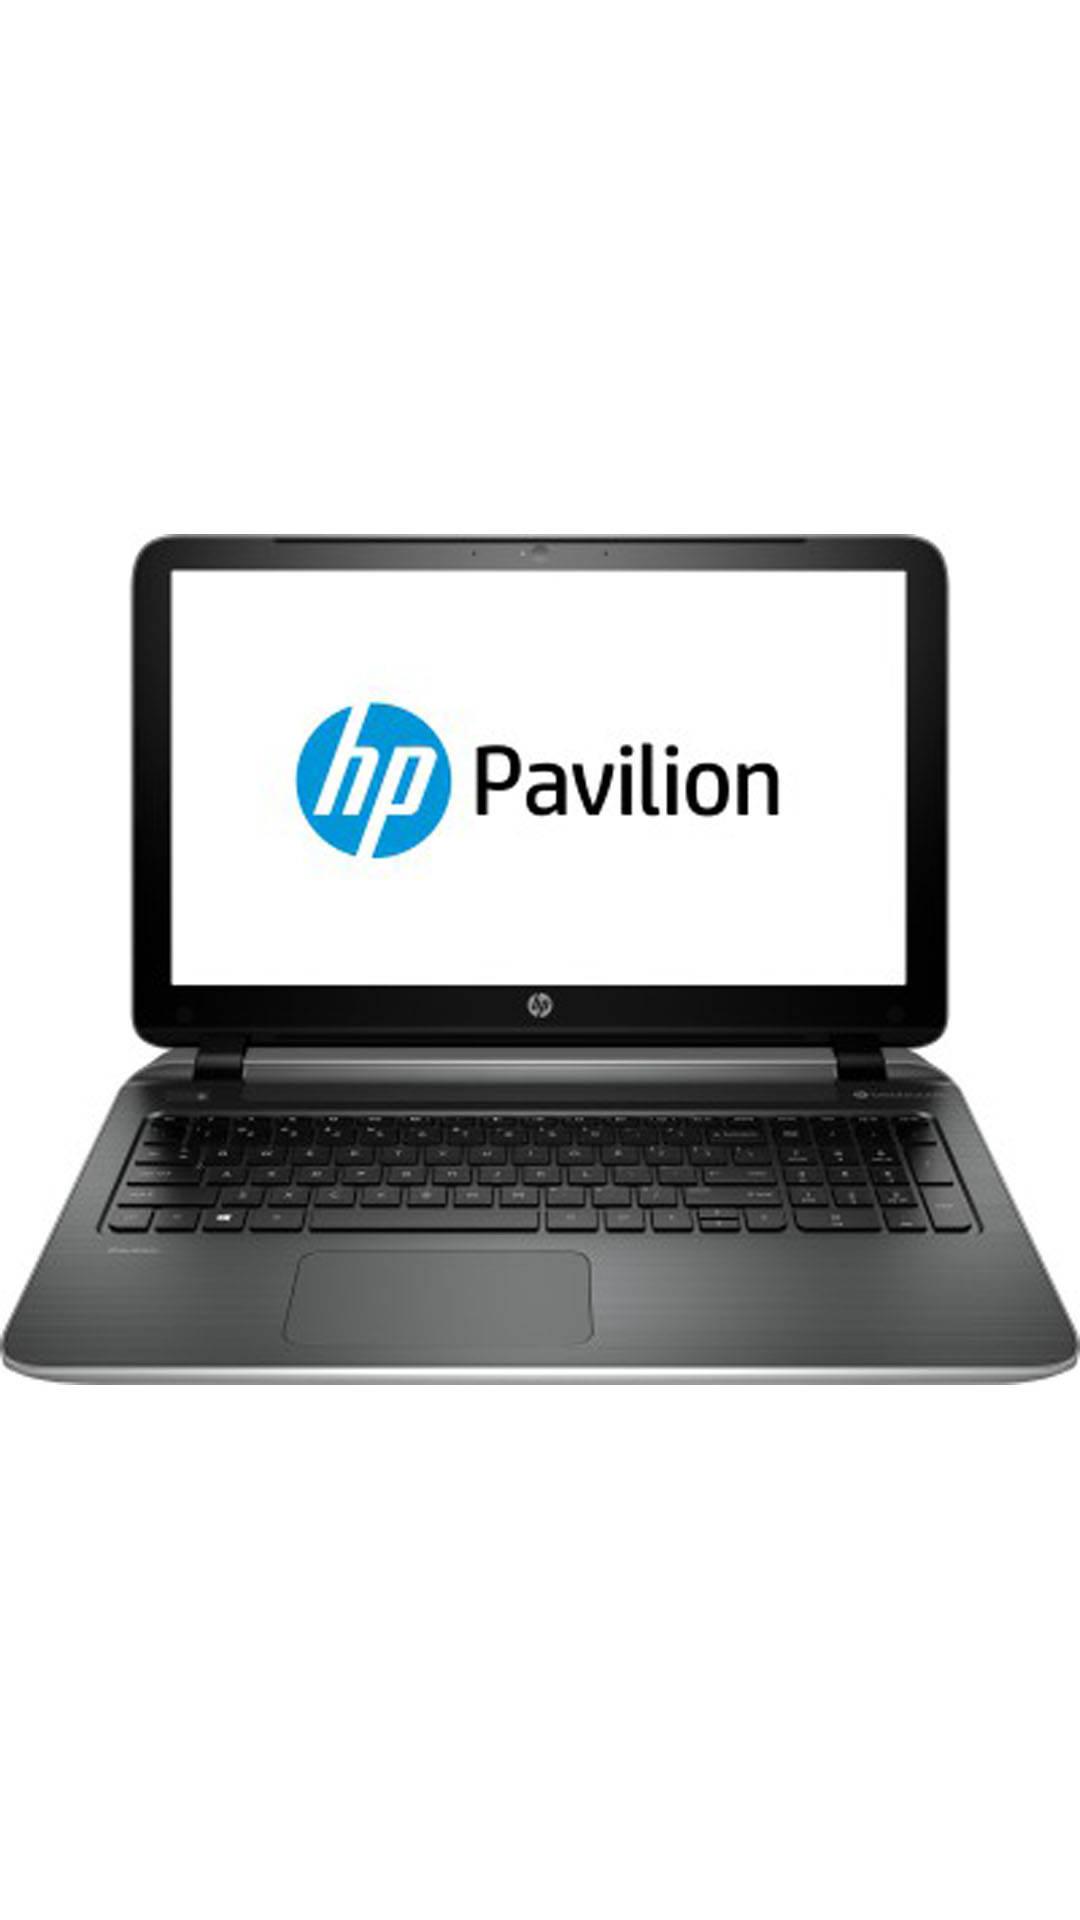 HP Pavilion 15 p201TU Notebook (K8U11PA) Image